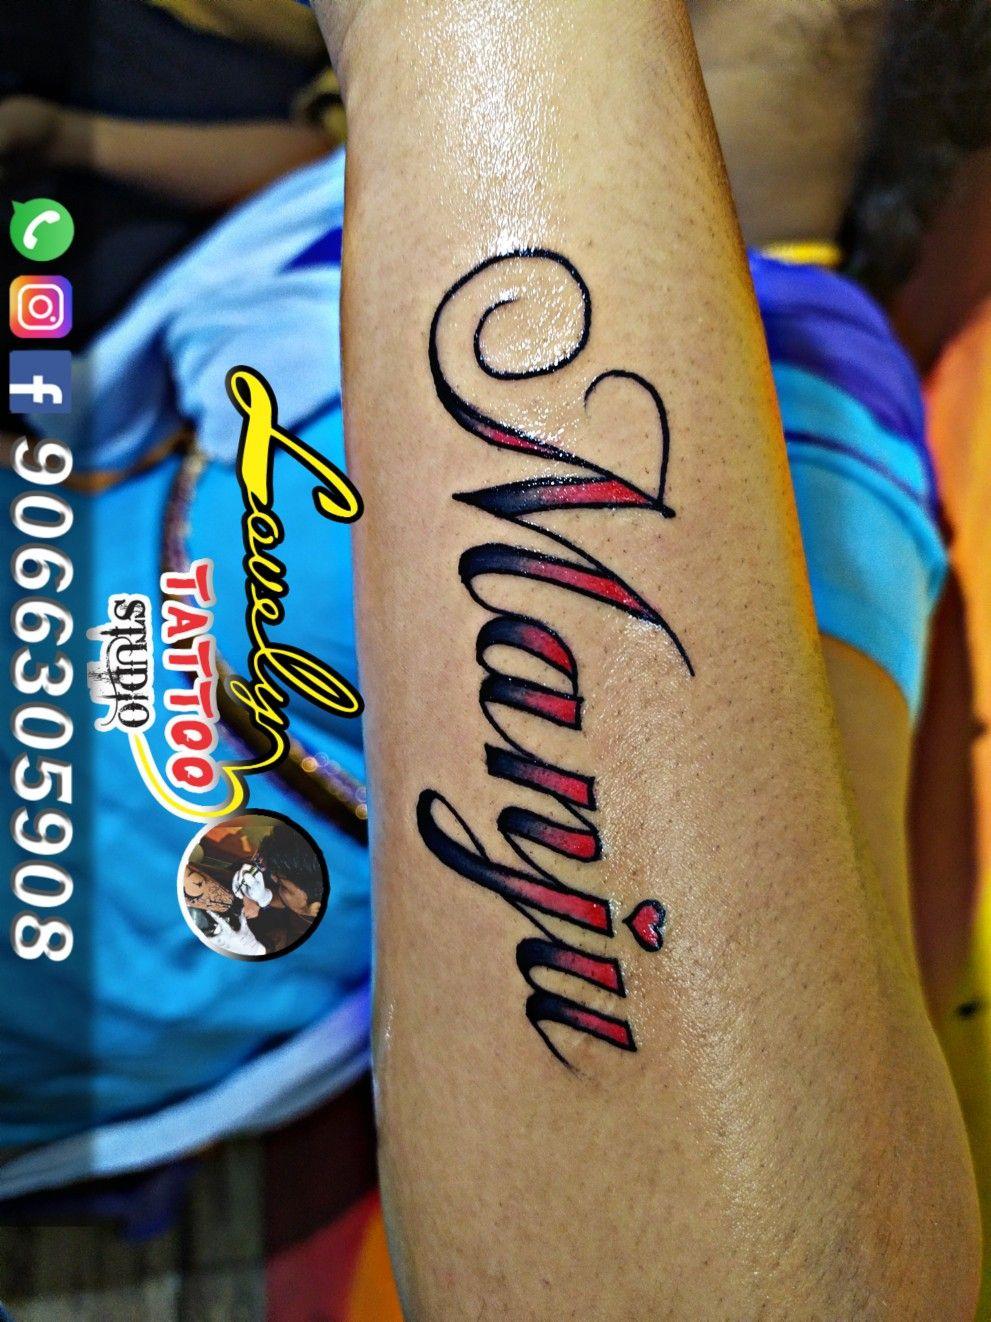 Manju Name Tattoo Manju Tattoo Font Design Call For Appointment 9066305908 Yelahanka Name Tattoo Tattoo Studio Tattoos